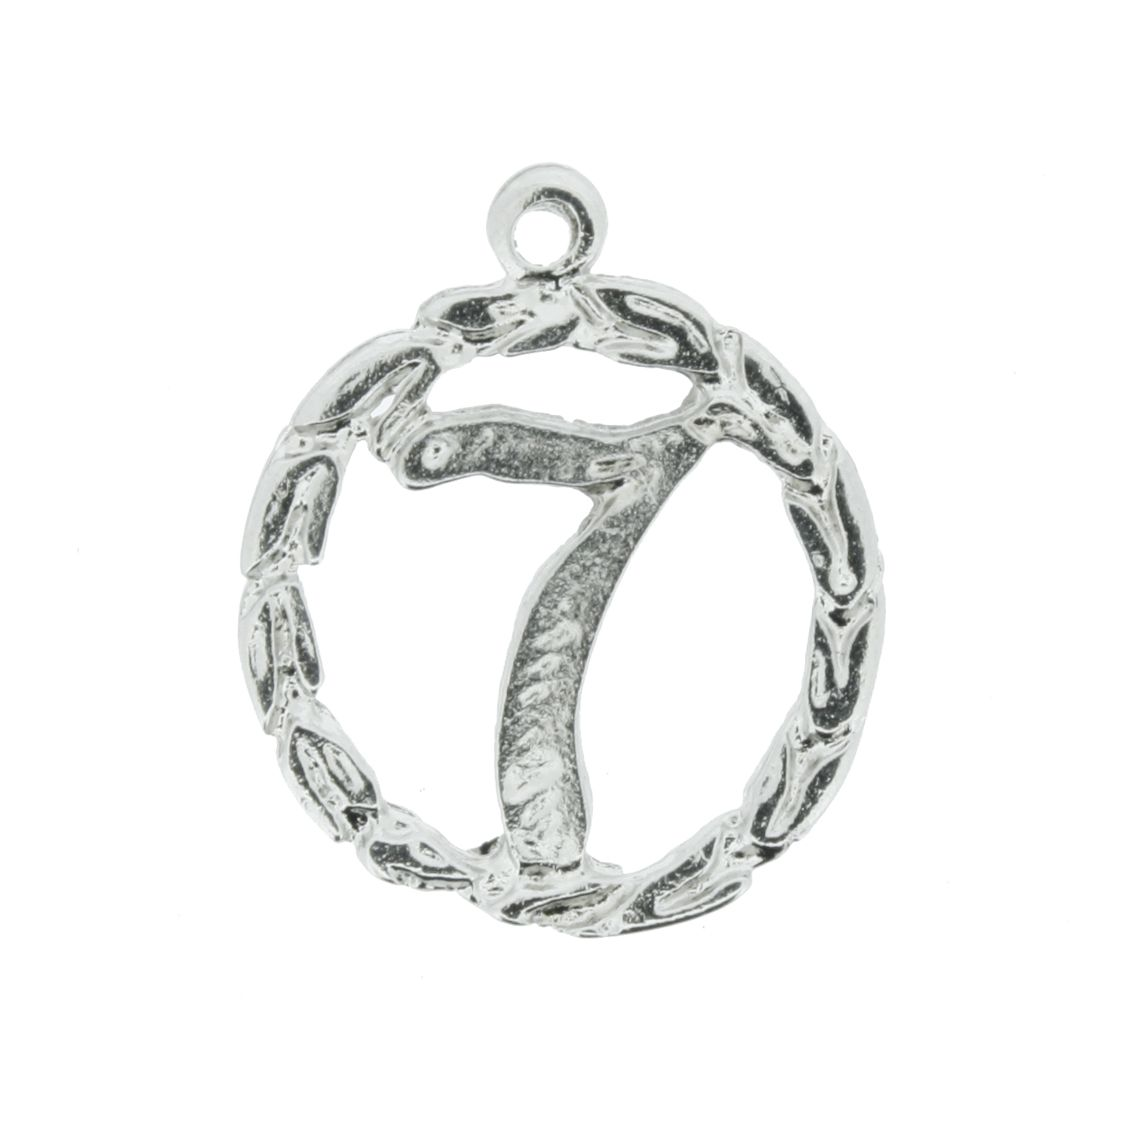 Sete - Níquel - 22mm  - Stéphanie Bijoux® - Peças para Bijuterias e Artesanato